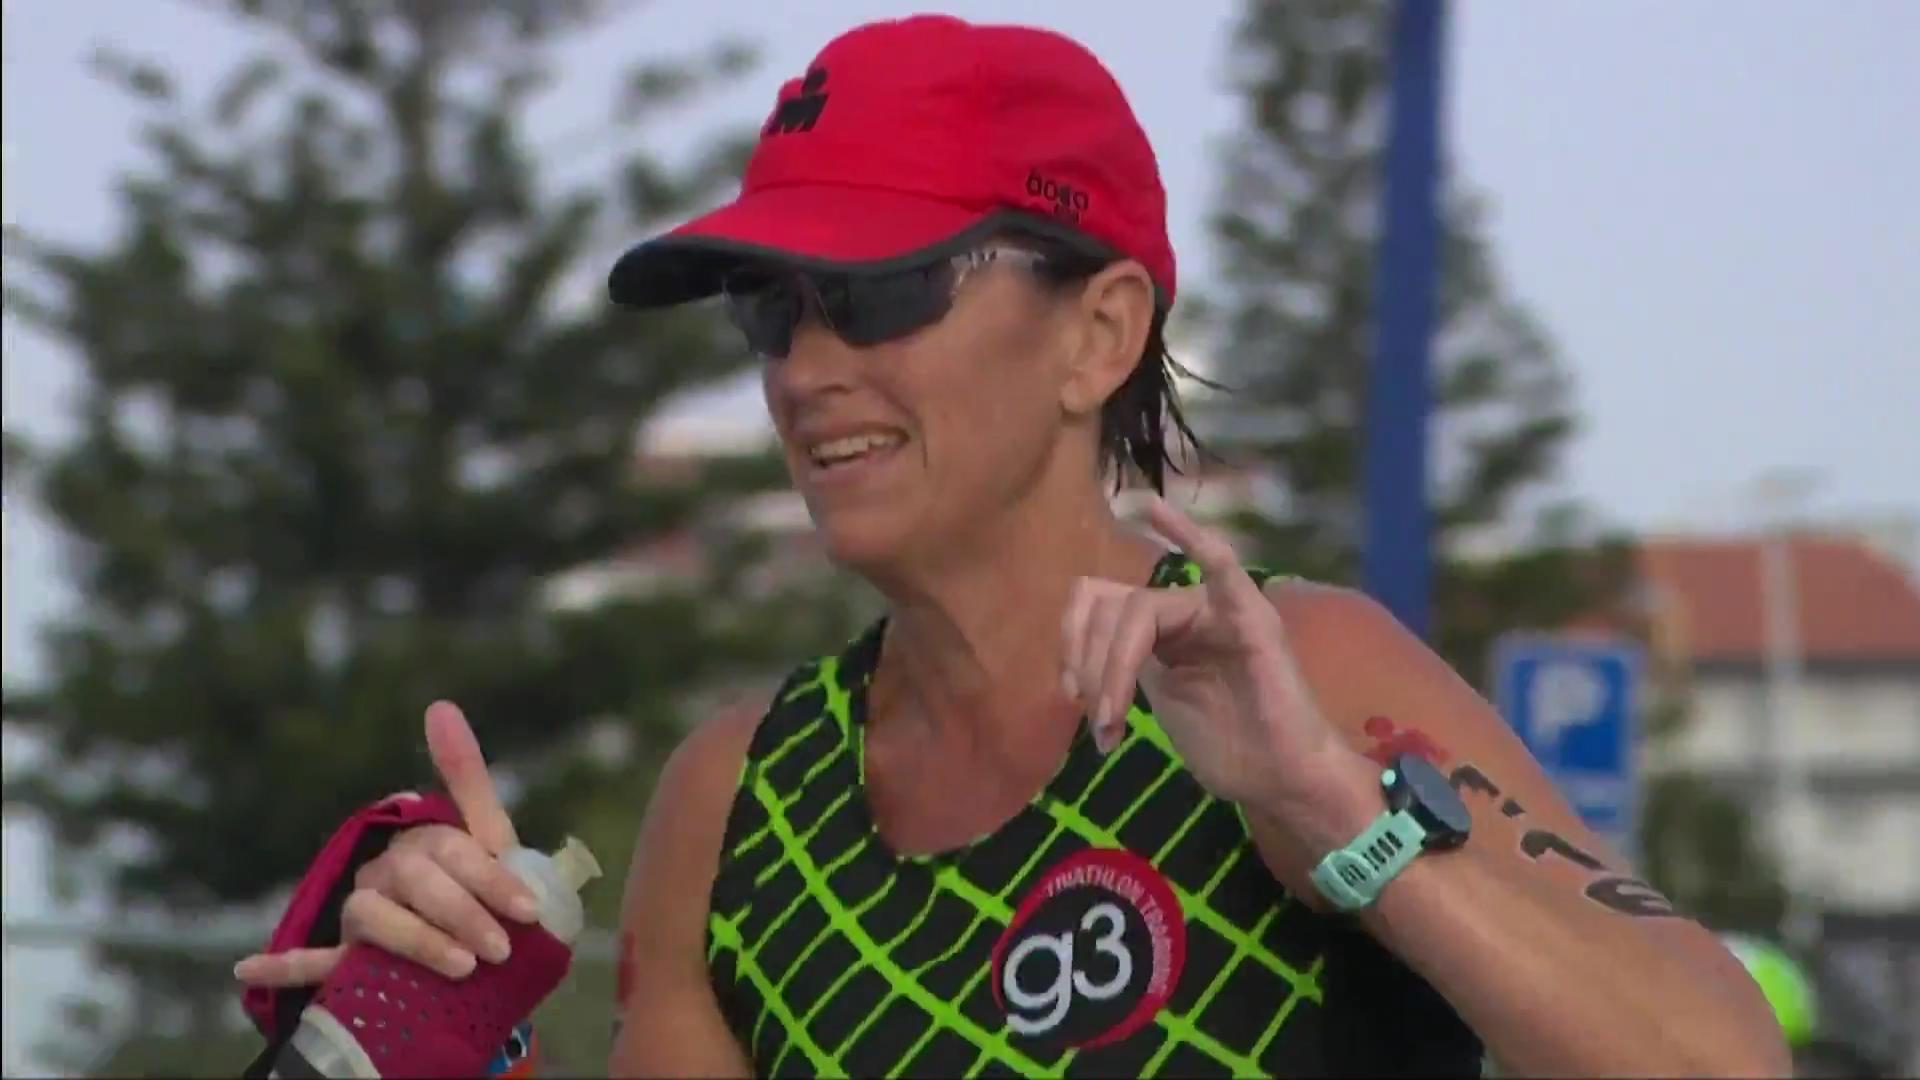 Melanie Cameron – Ironman World Championship 2018 9